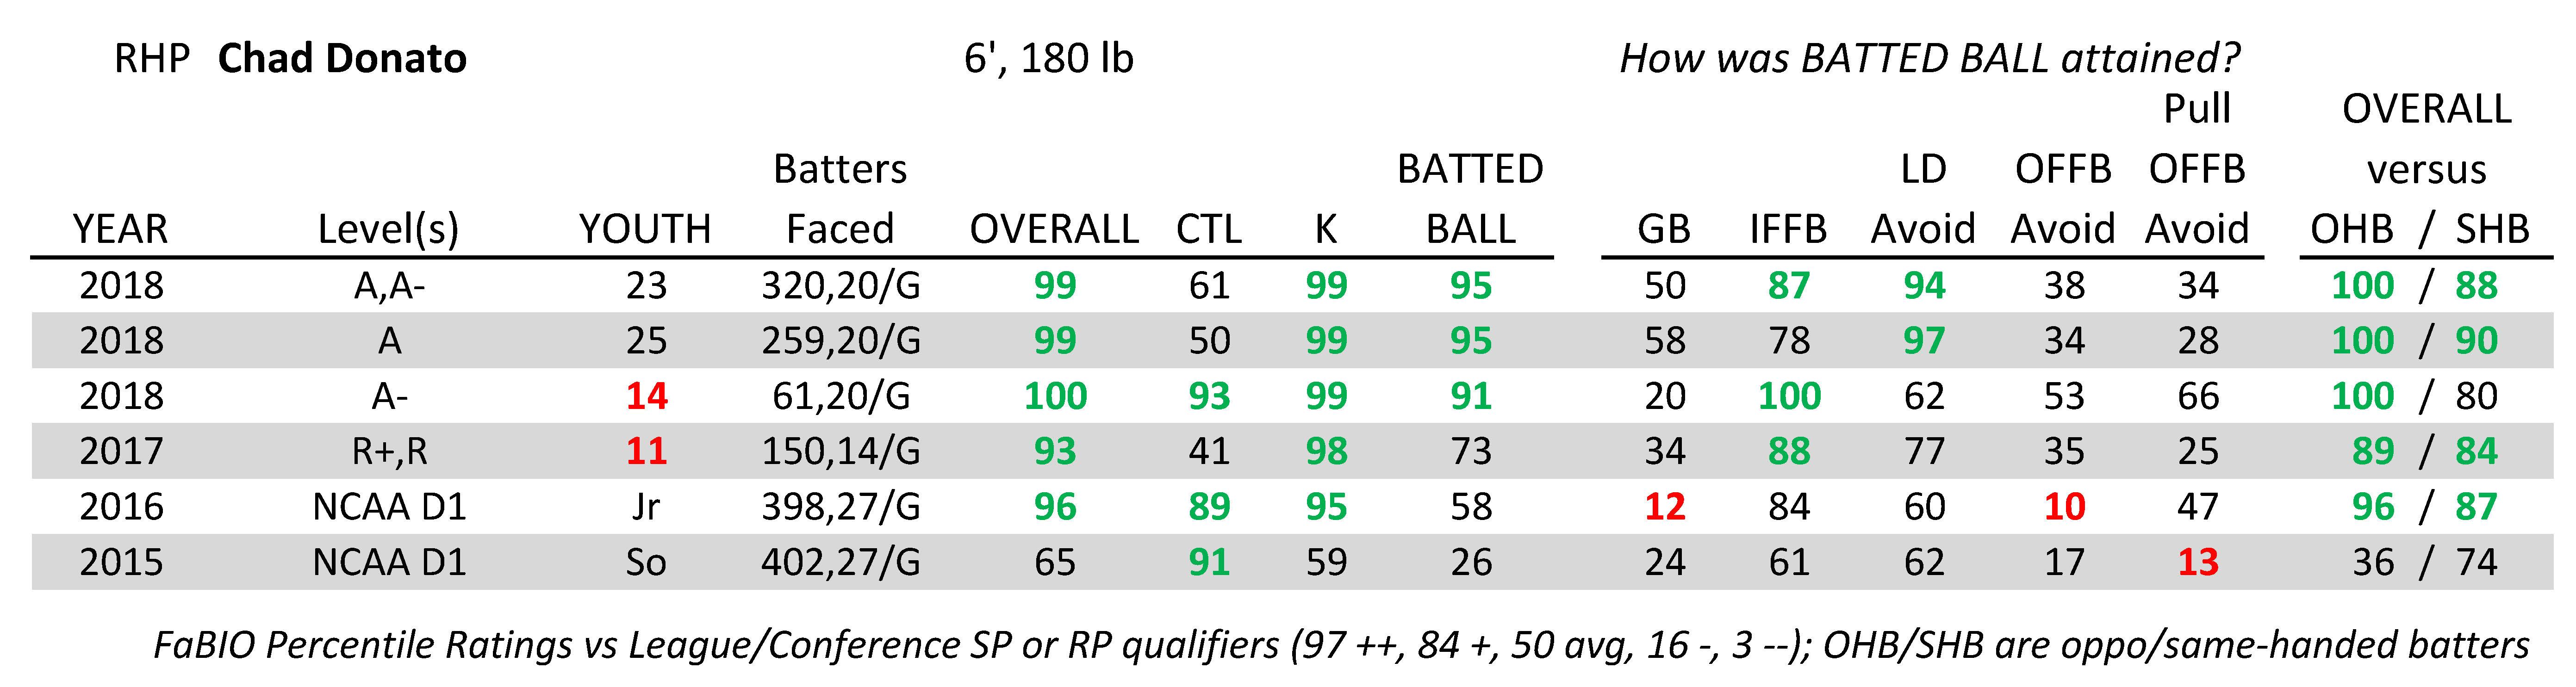 2019 Preseason Top Pitching Prospects: Houston Astros - The Crawfish